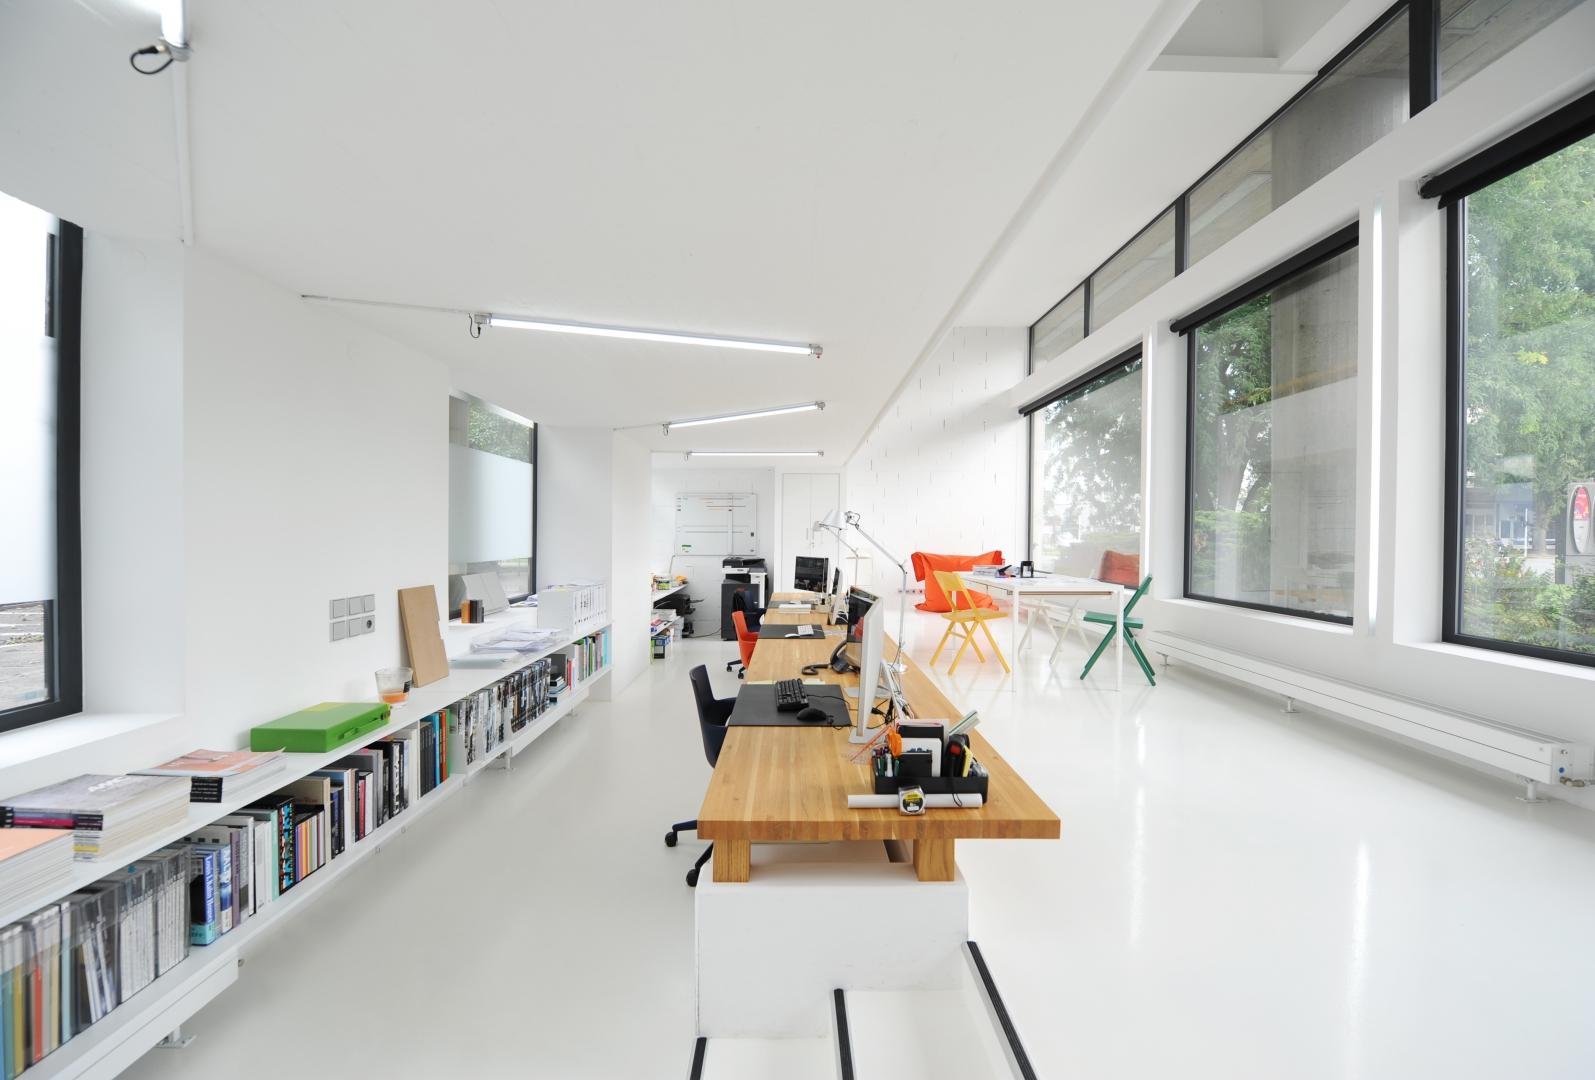 Agence HR Mulhouse, 2012 - 2013 | Henner + Roland Architectes